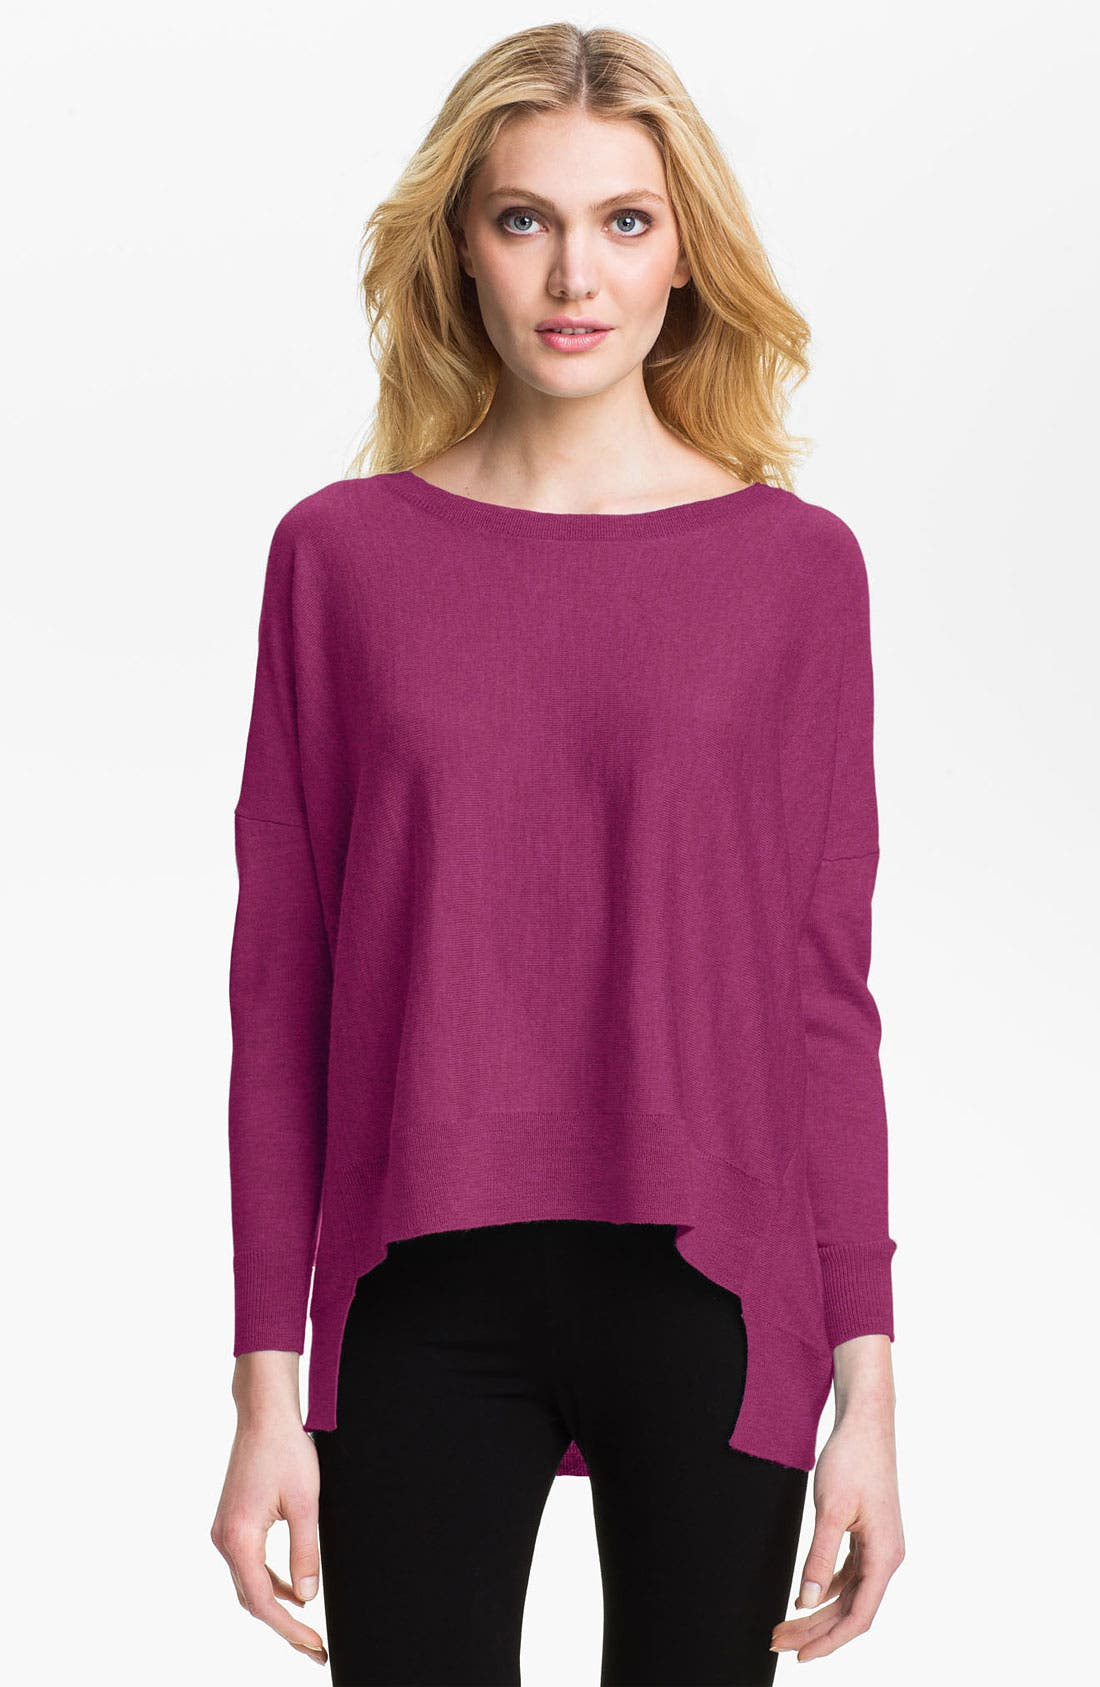 Alternate Image 1 Selected - Eileen Fisher Ballet Neck Merino Sweater (Petite)